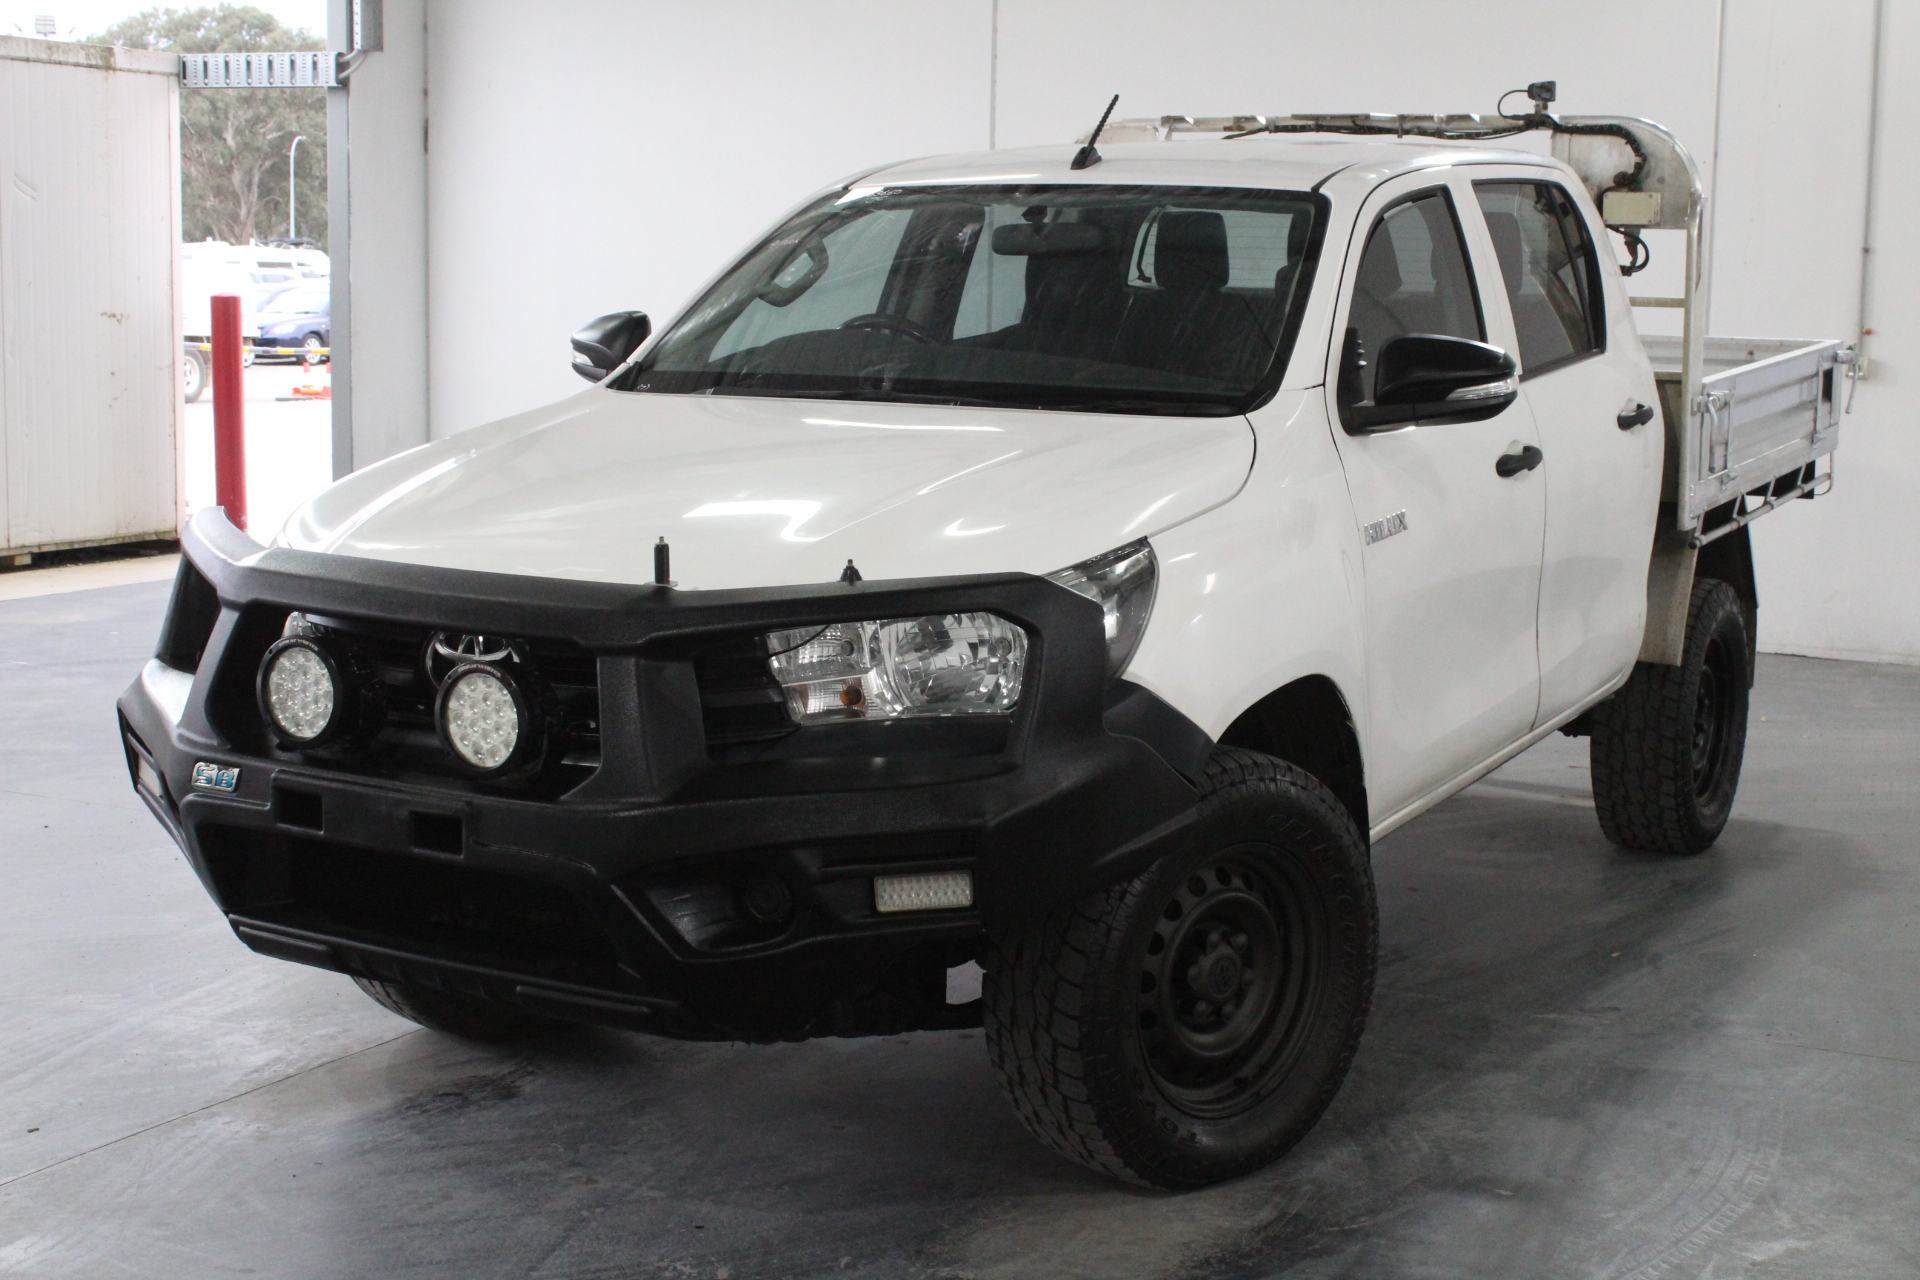 2015 Toyota Hilux Workmate (4x4) GUN125R Turbo Diesel Automatic Dual Cab